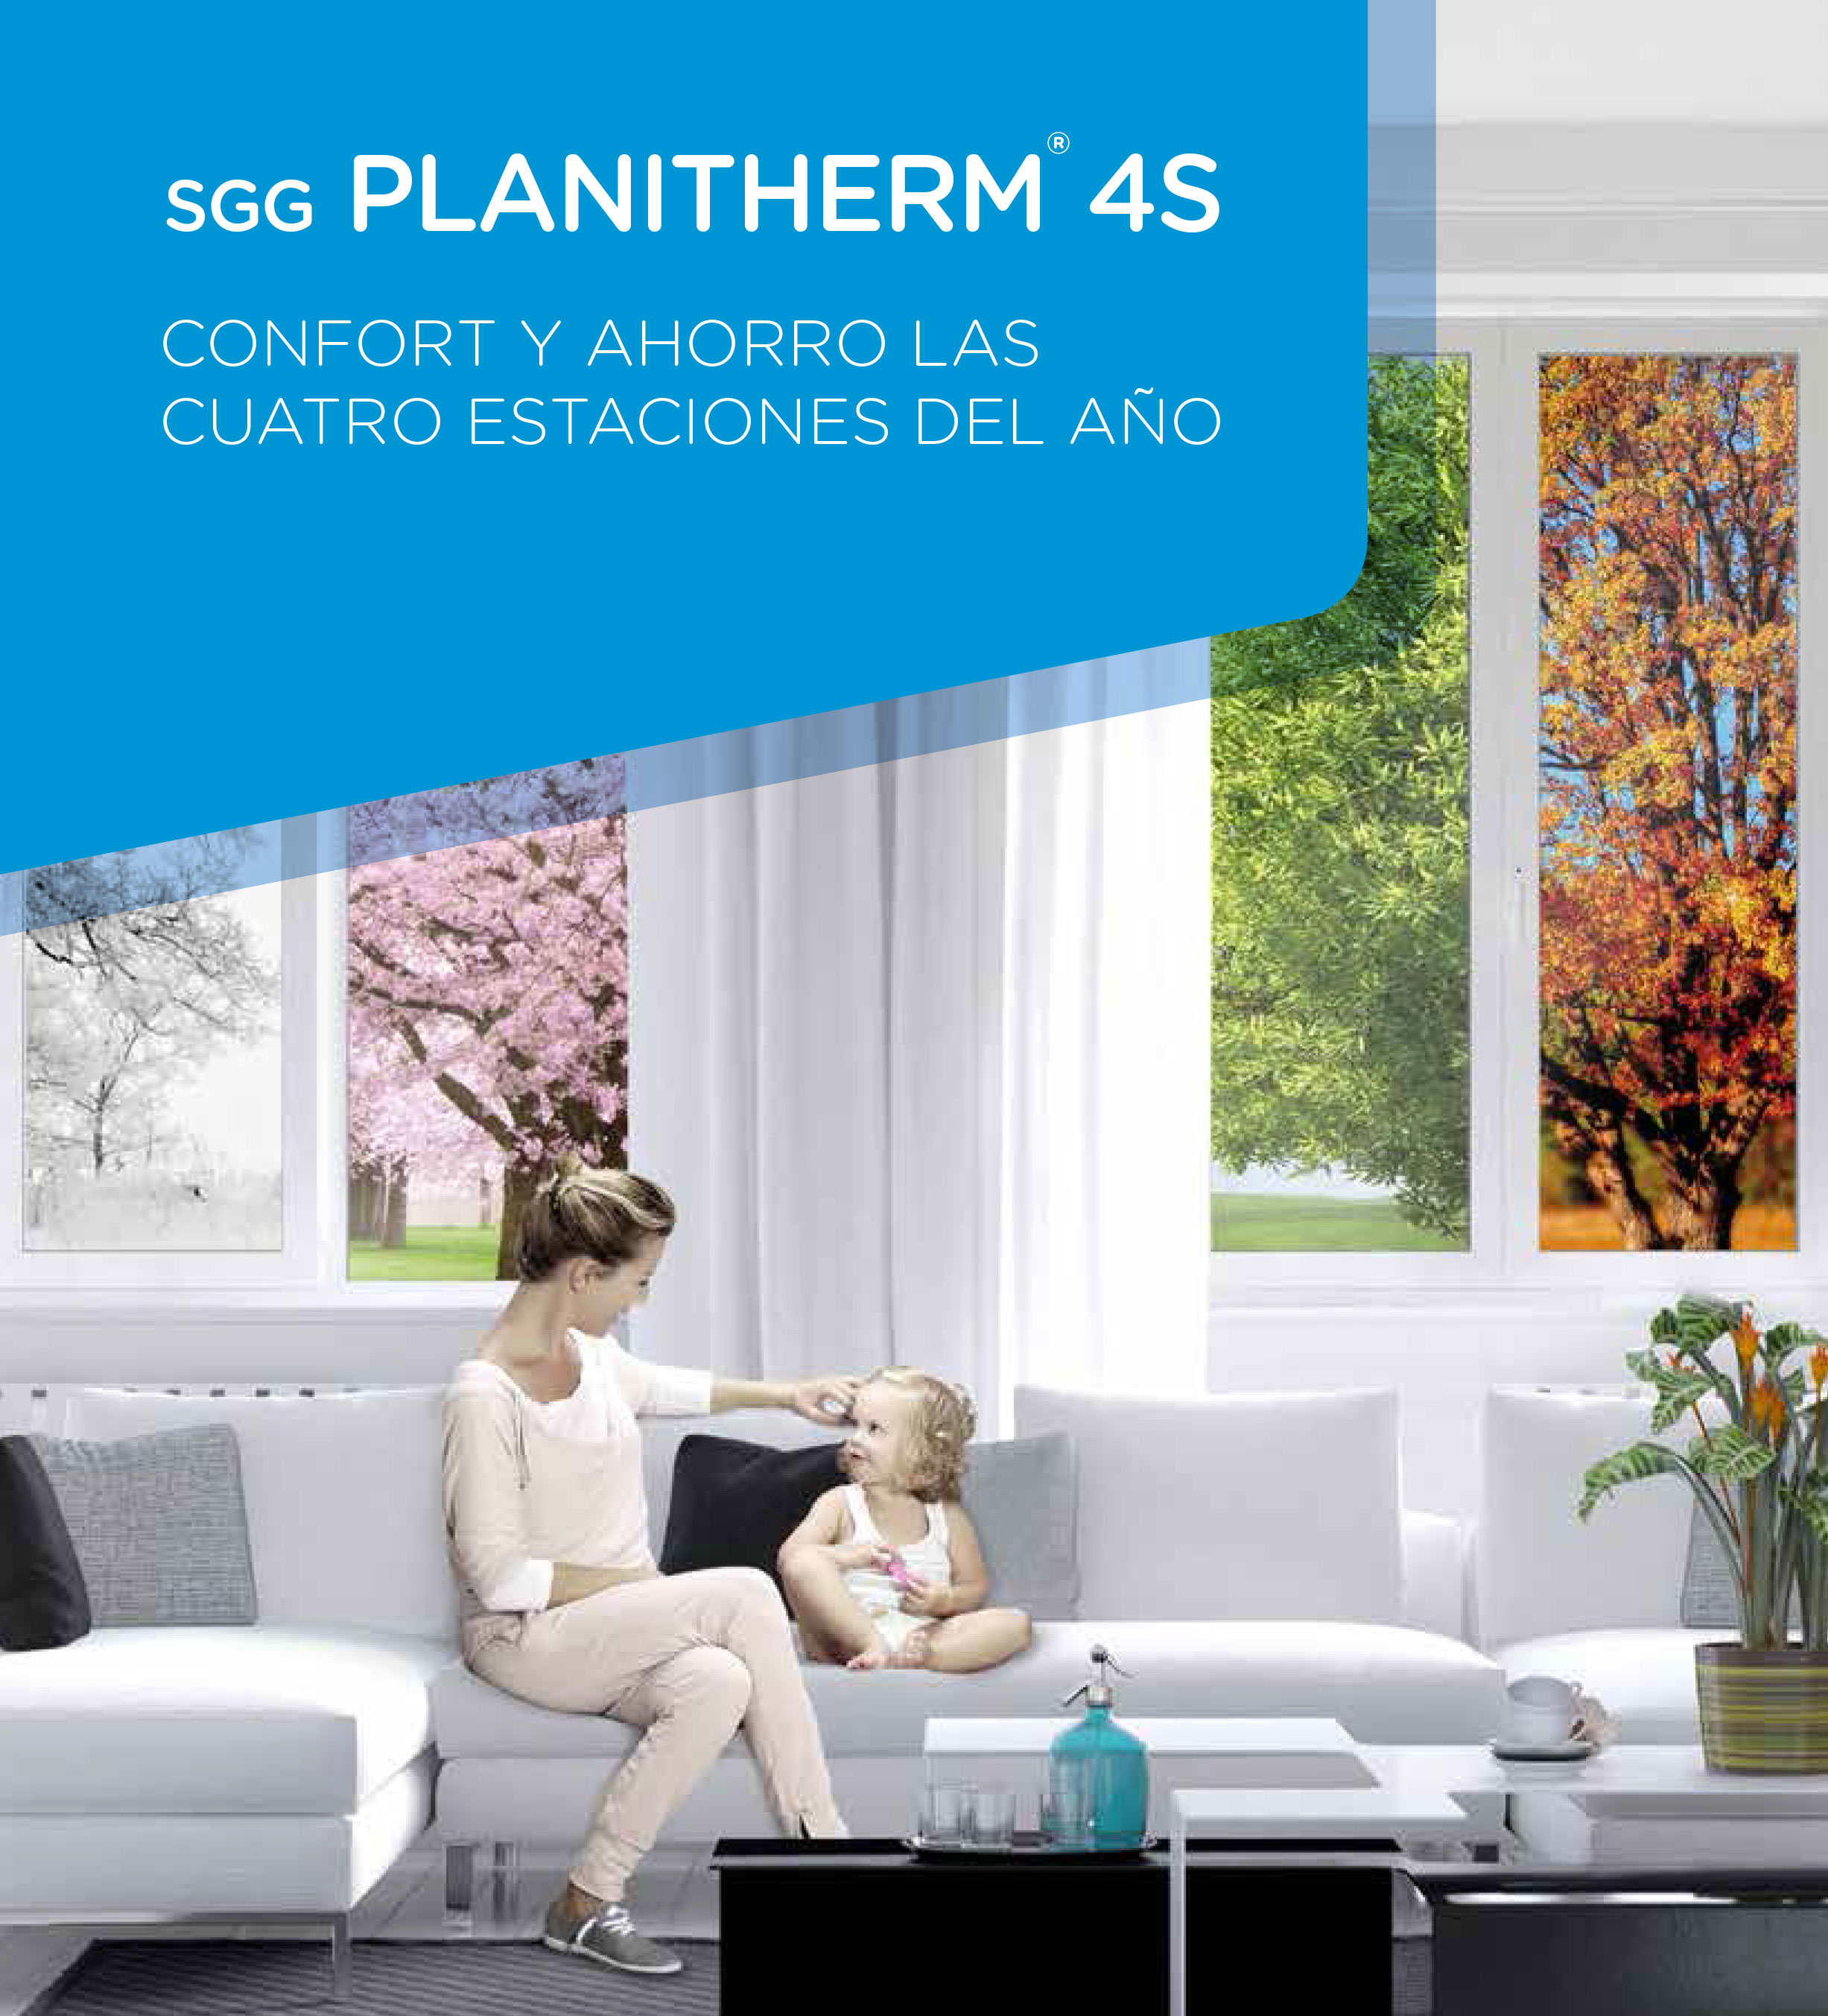 DOBLE ACRISTALAMIENTO:  « PLANITHERM 4 S »